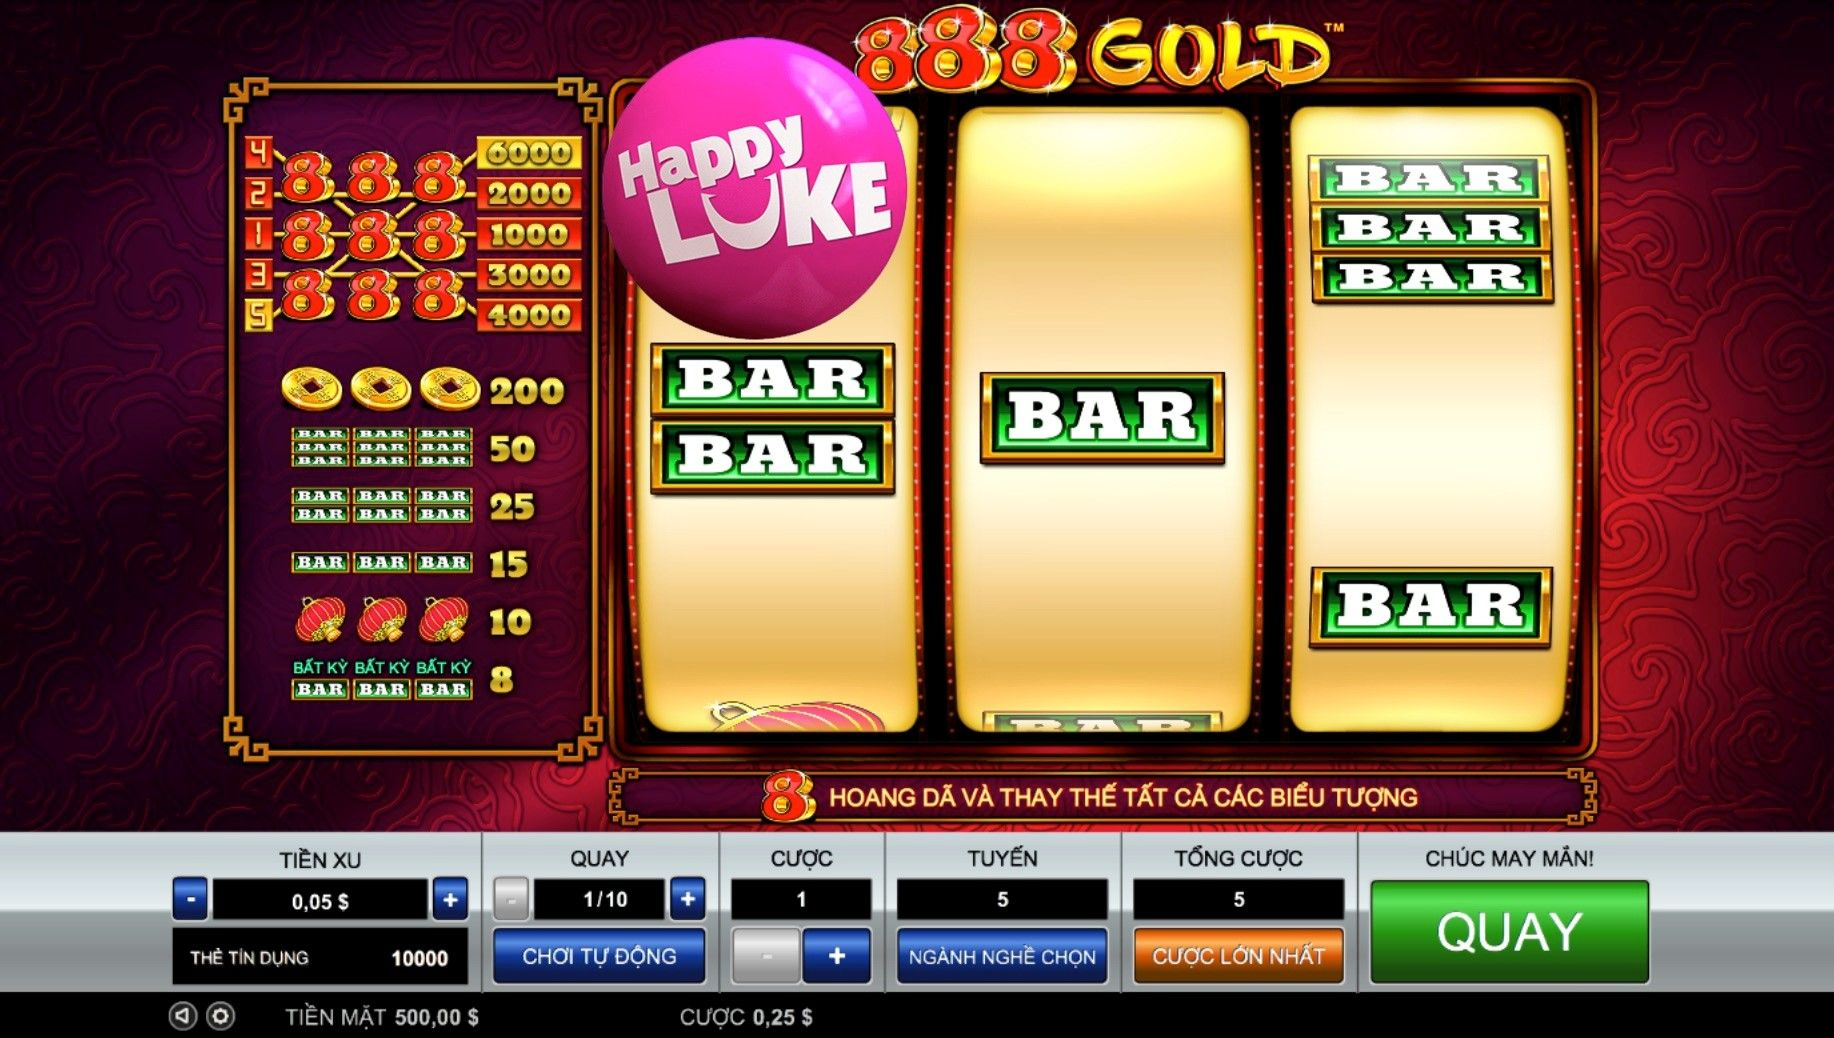 Margaritaville casino biloxi ms employment